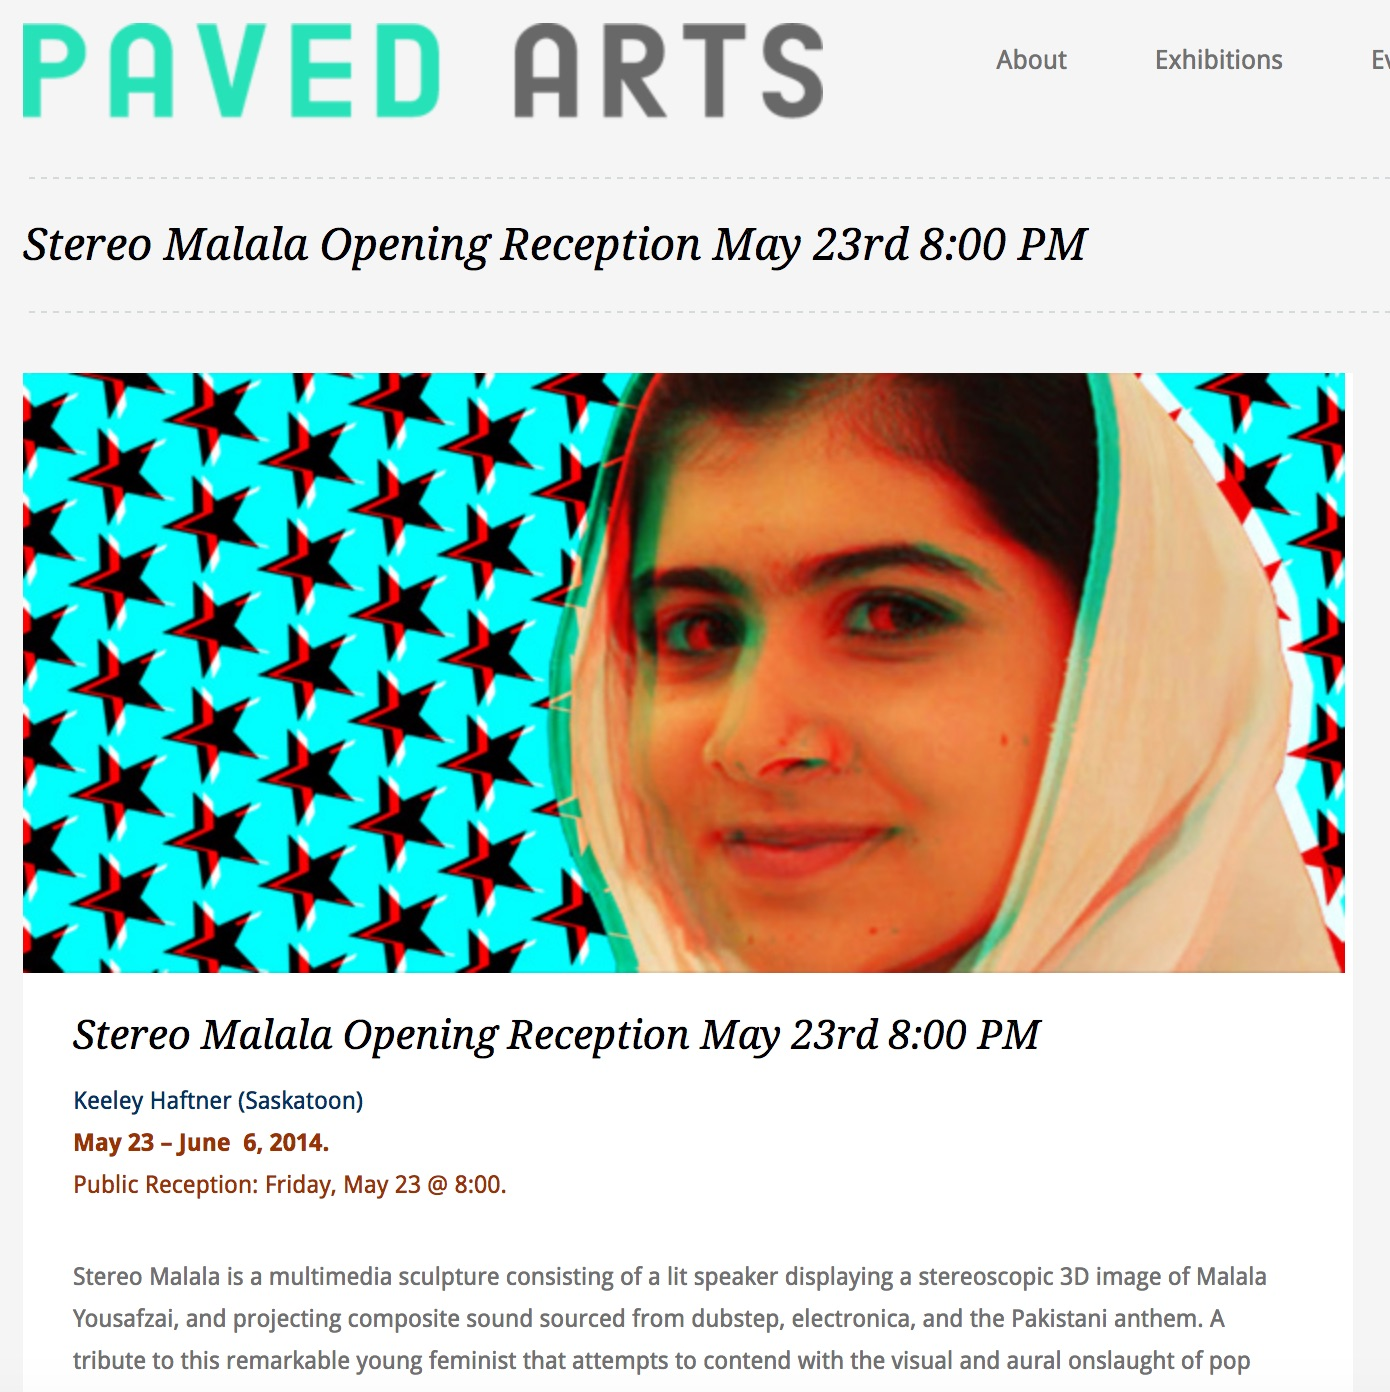 2014: Stereo Malala